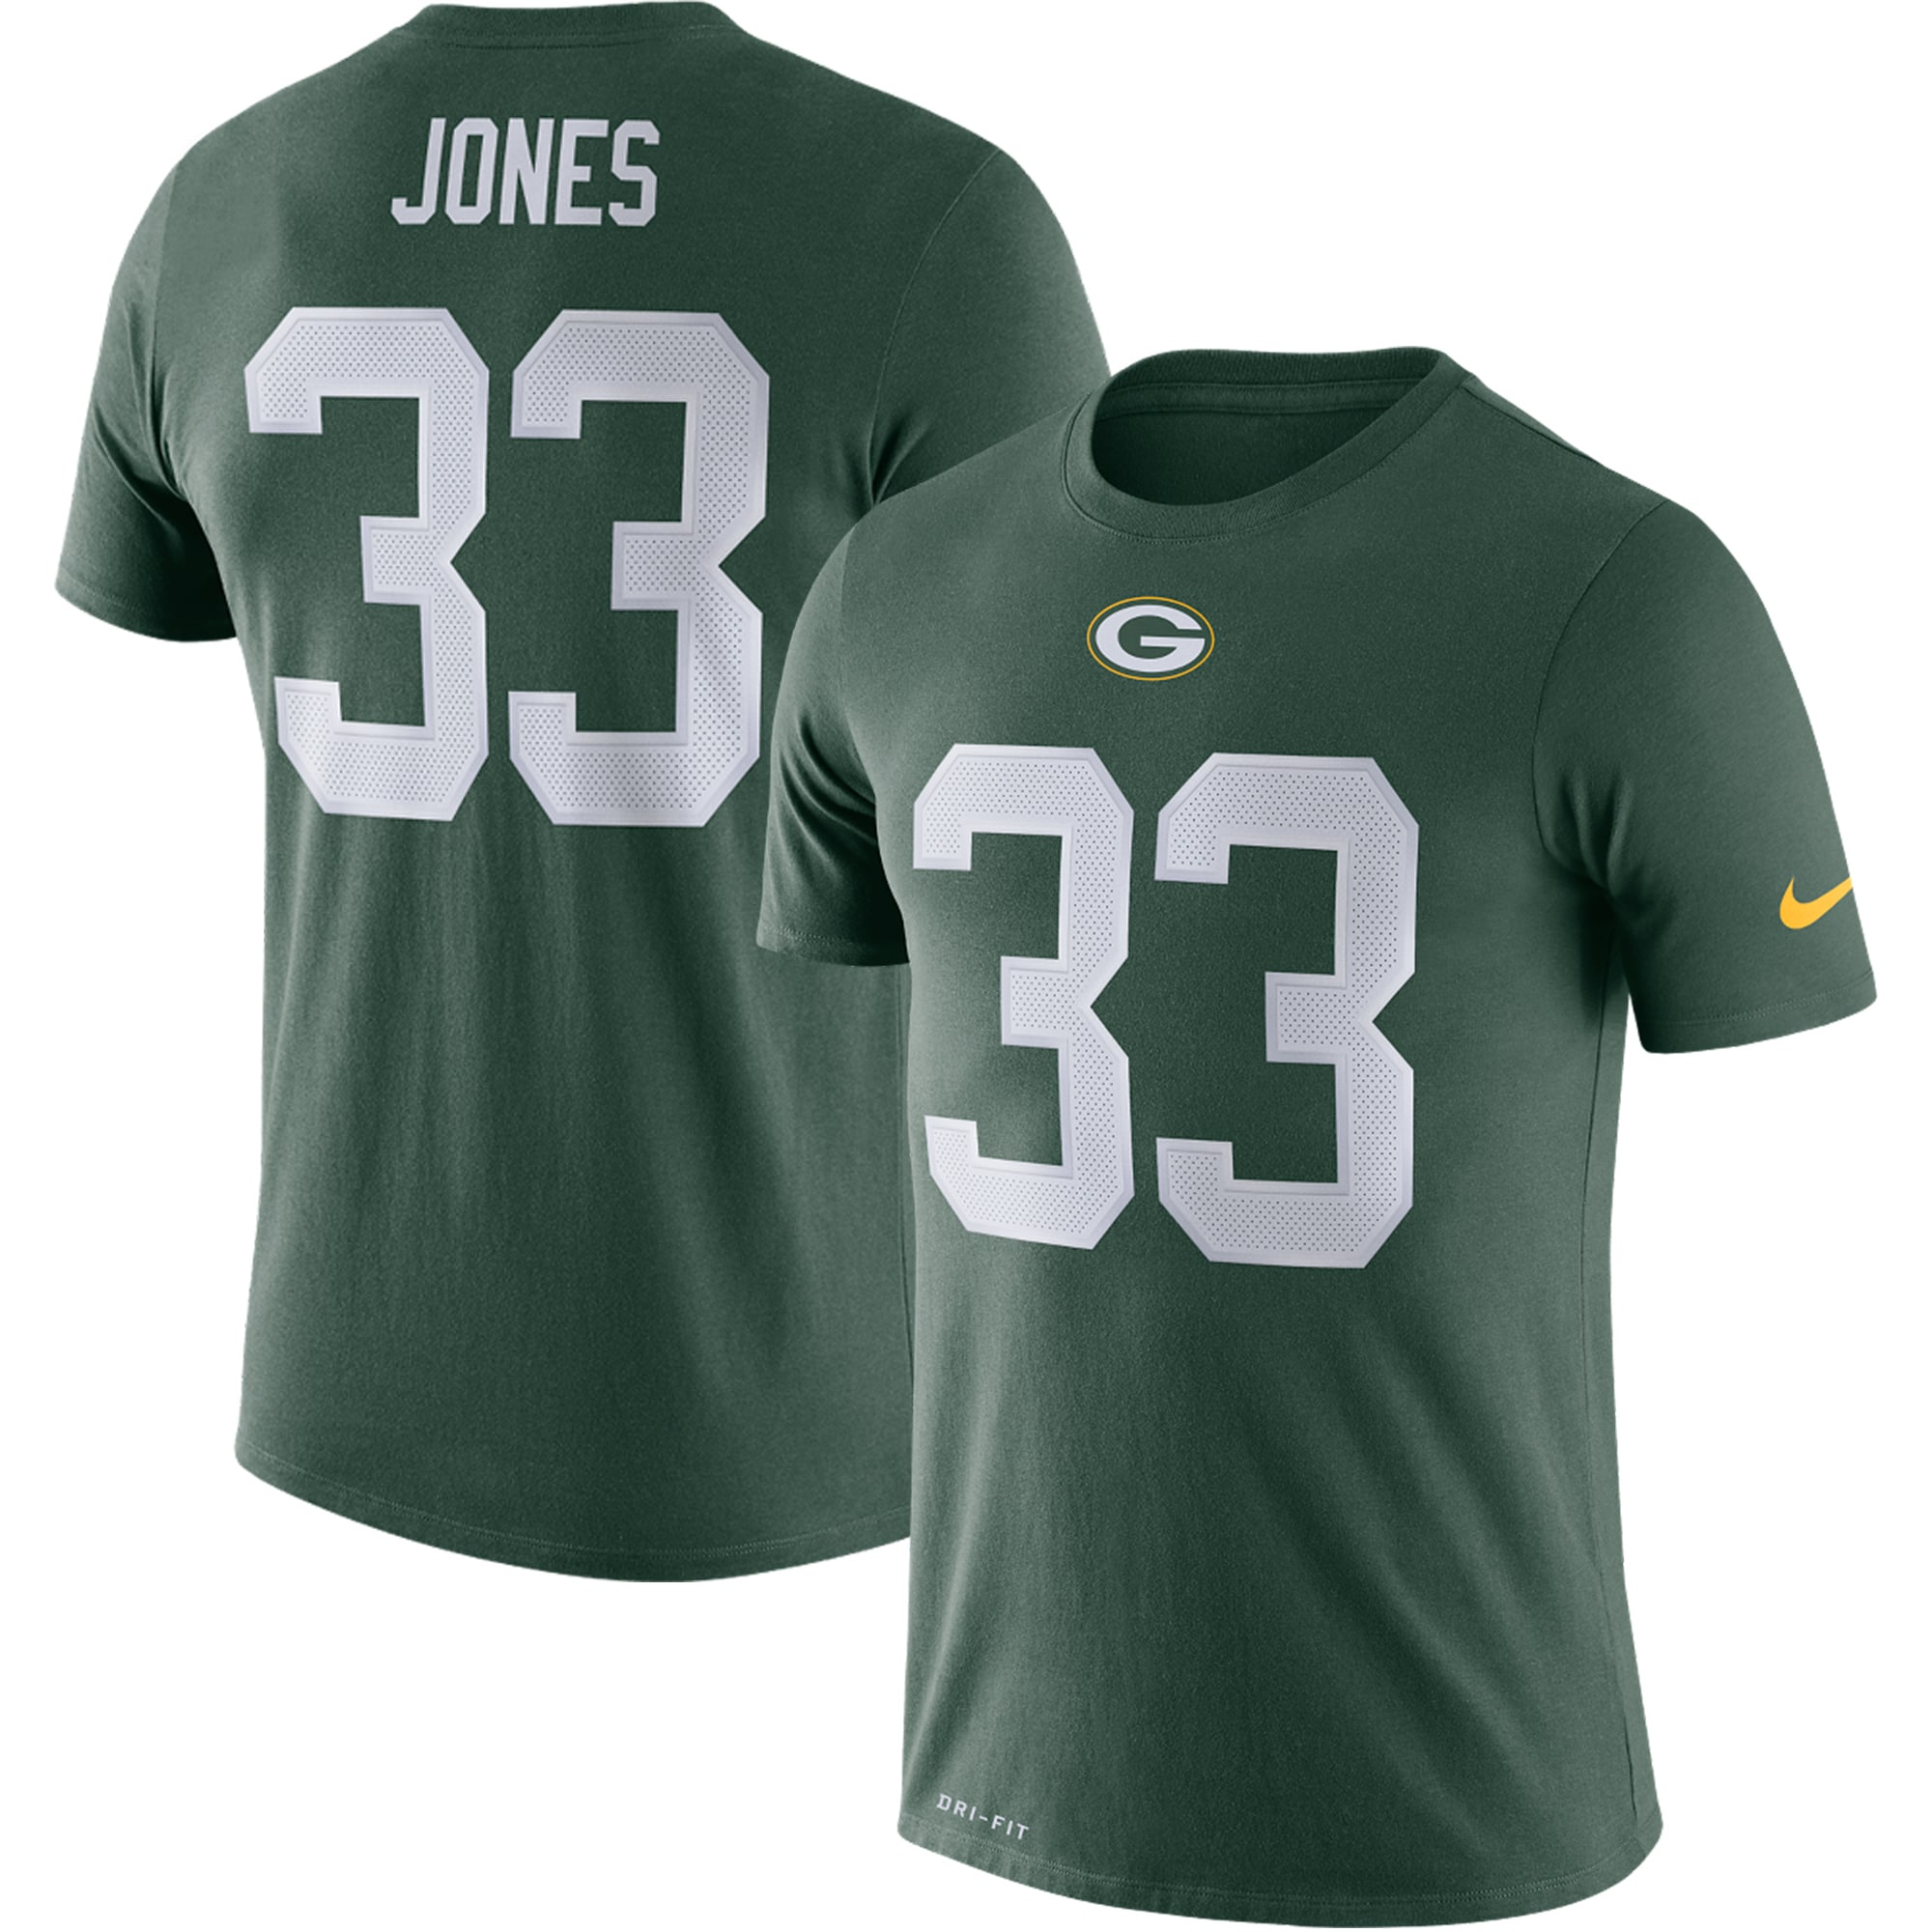 Aaron Jones Green Bay Packers Nike Player Pride 3.0 Name & Number Performance T-Shirt - Green